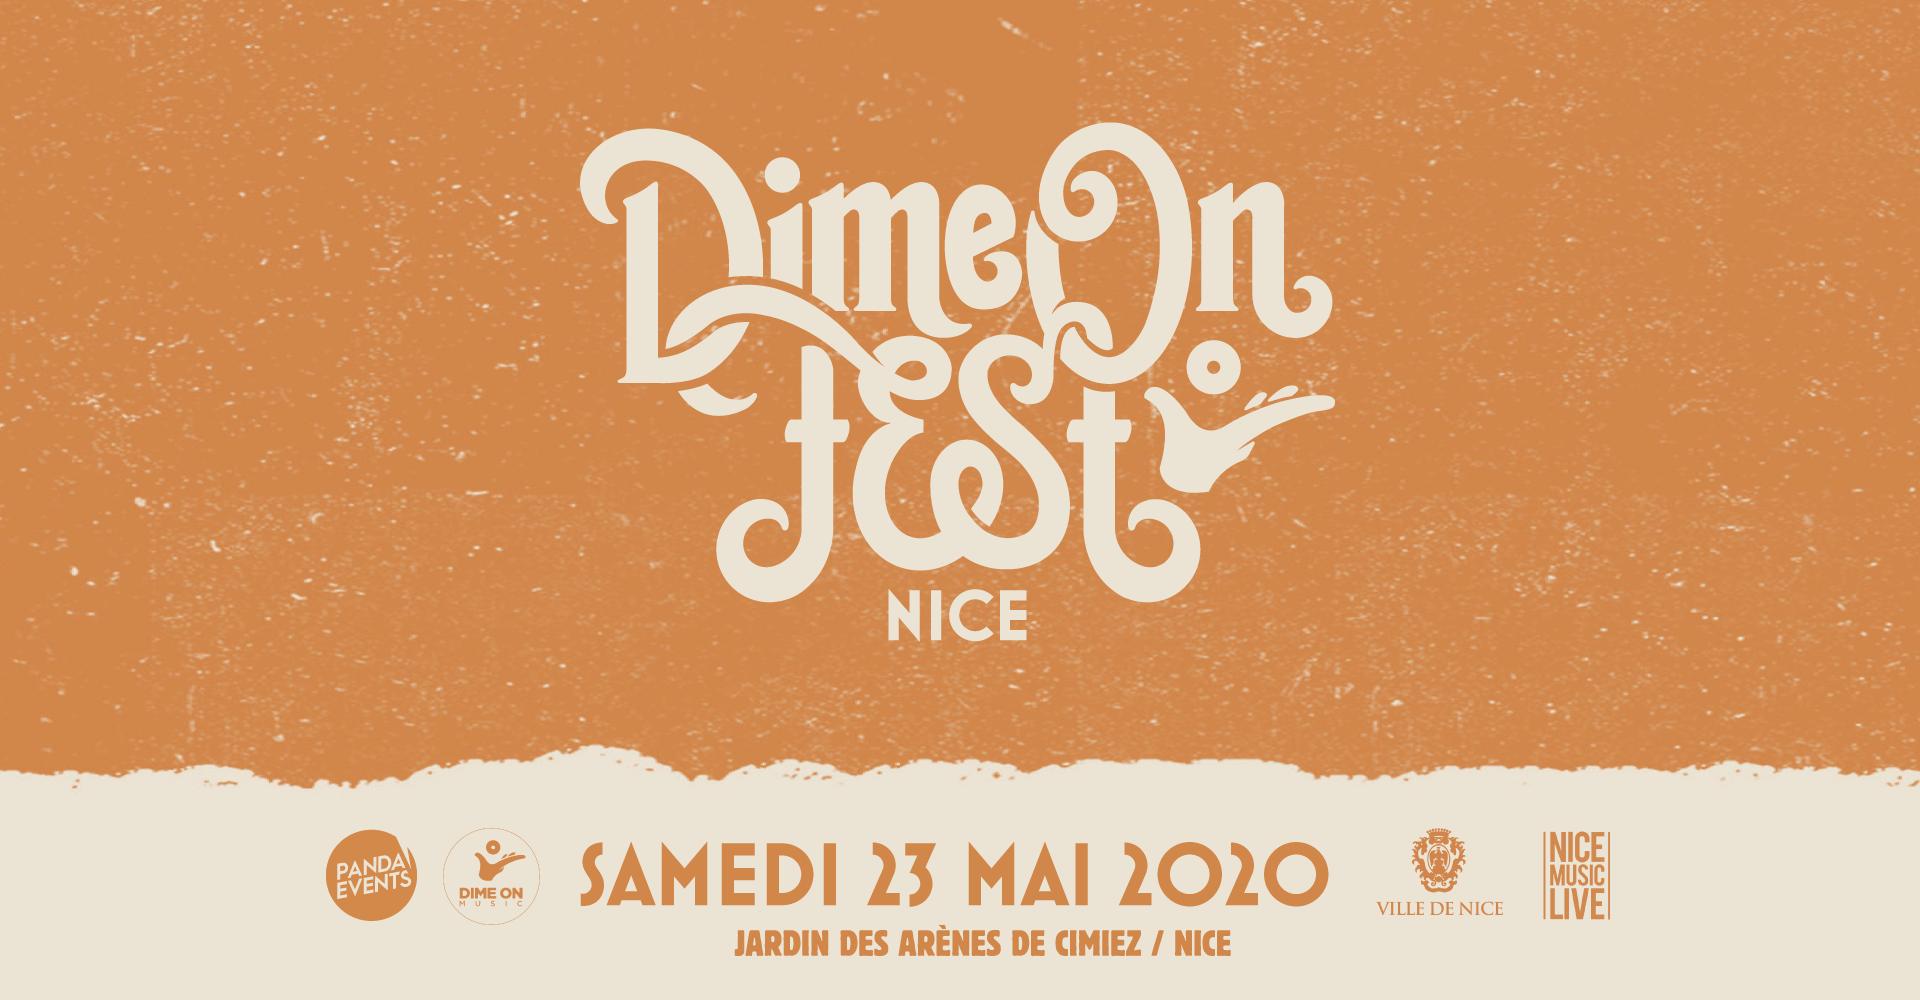 Dime on Fest 2020